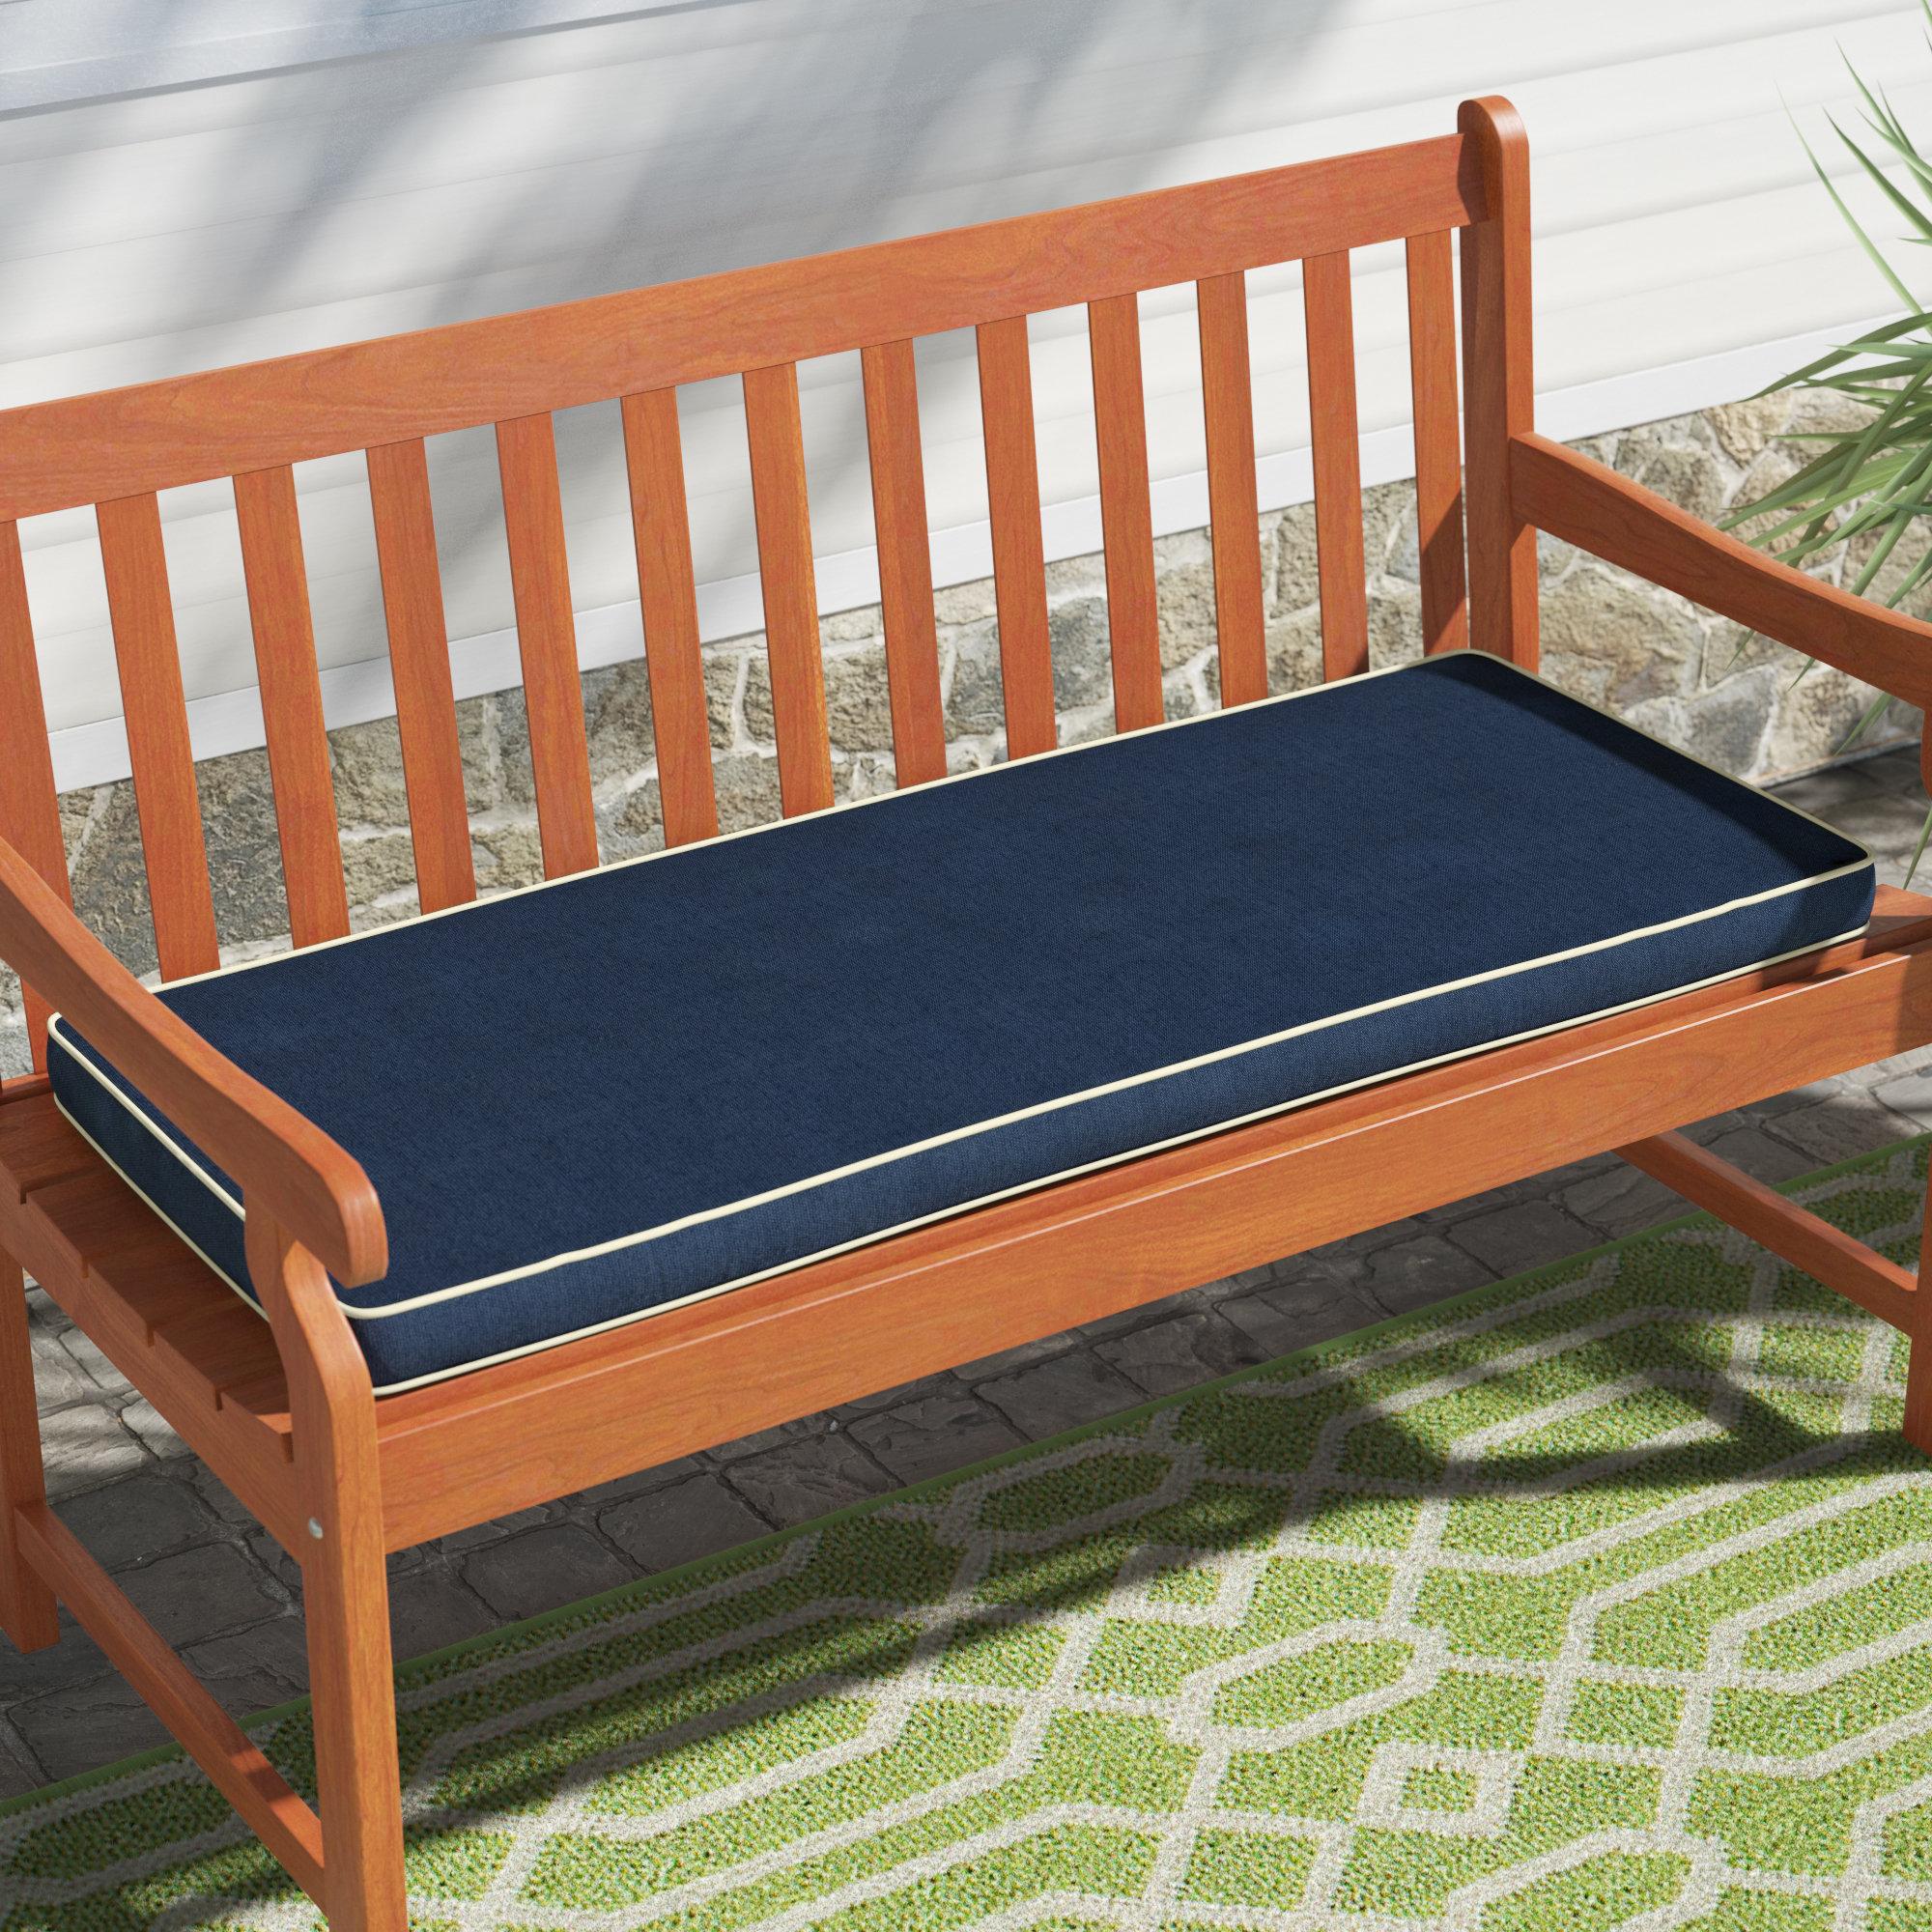 Gentil Holoubkov Indoor/Outdoor Sunbrella Bench Cushion